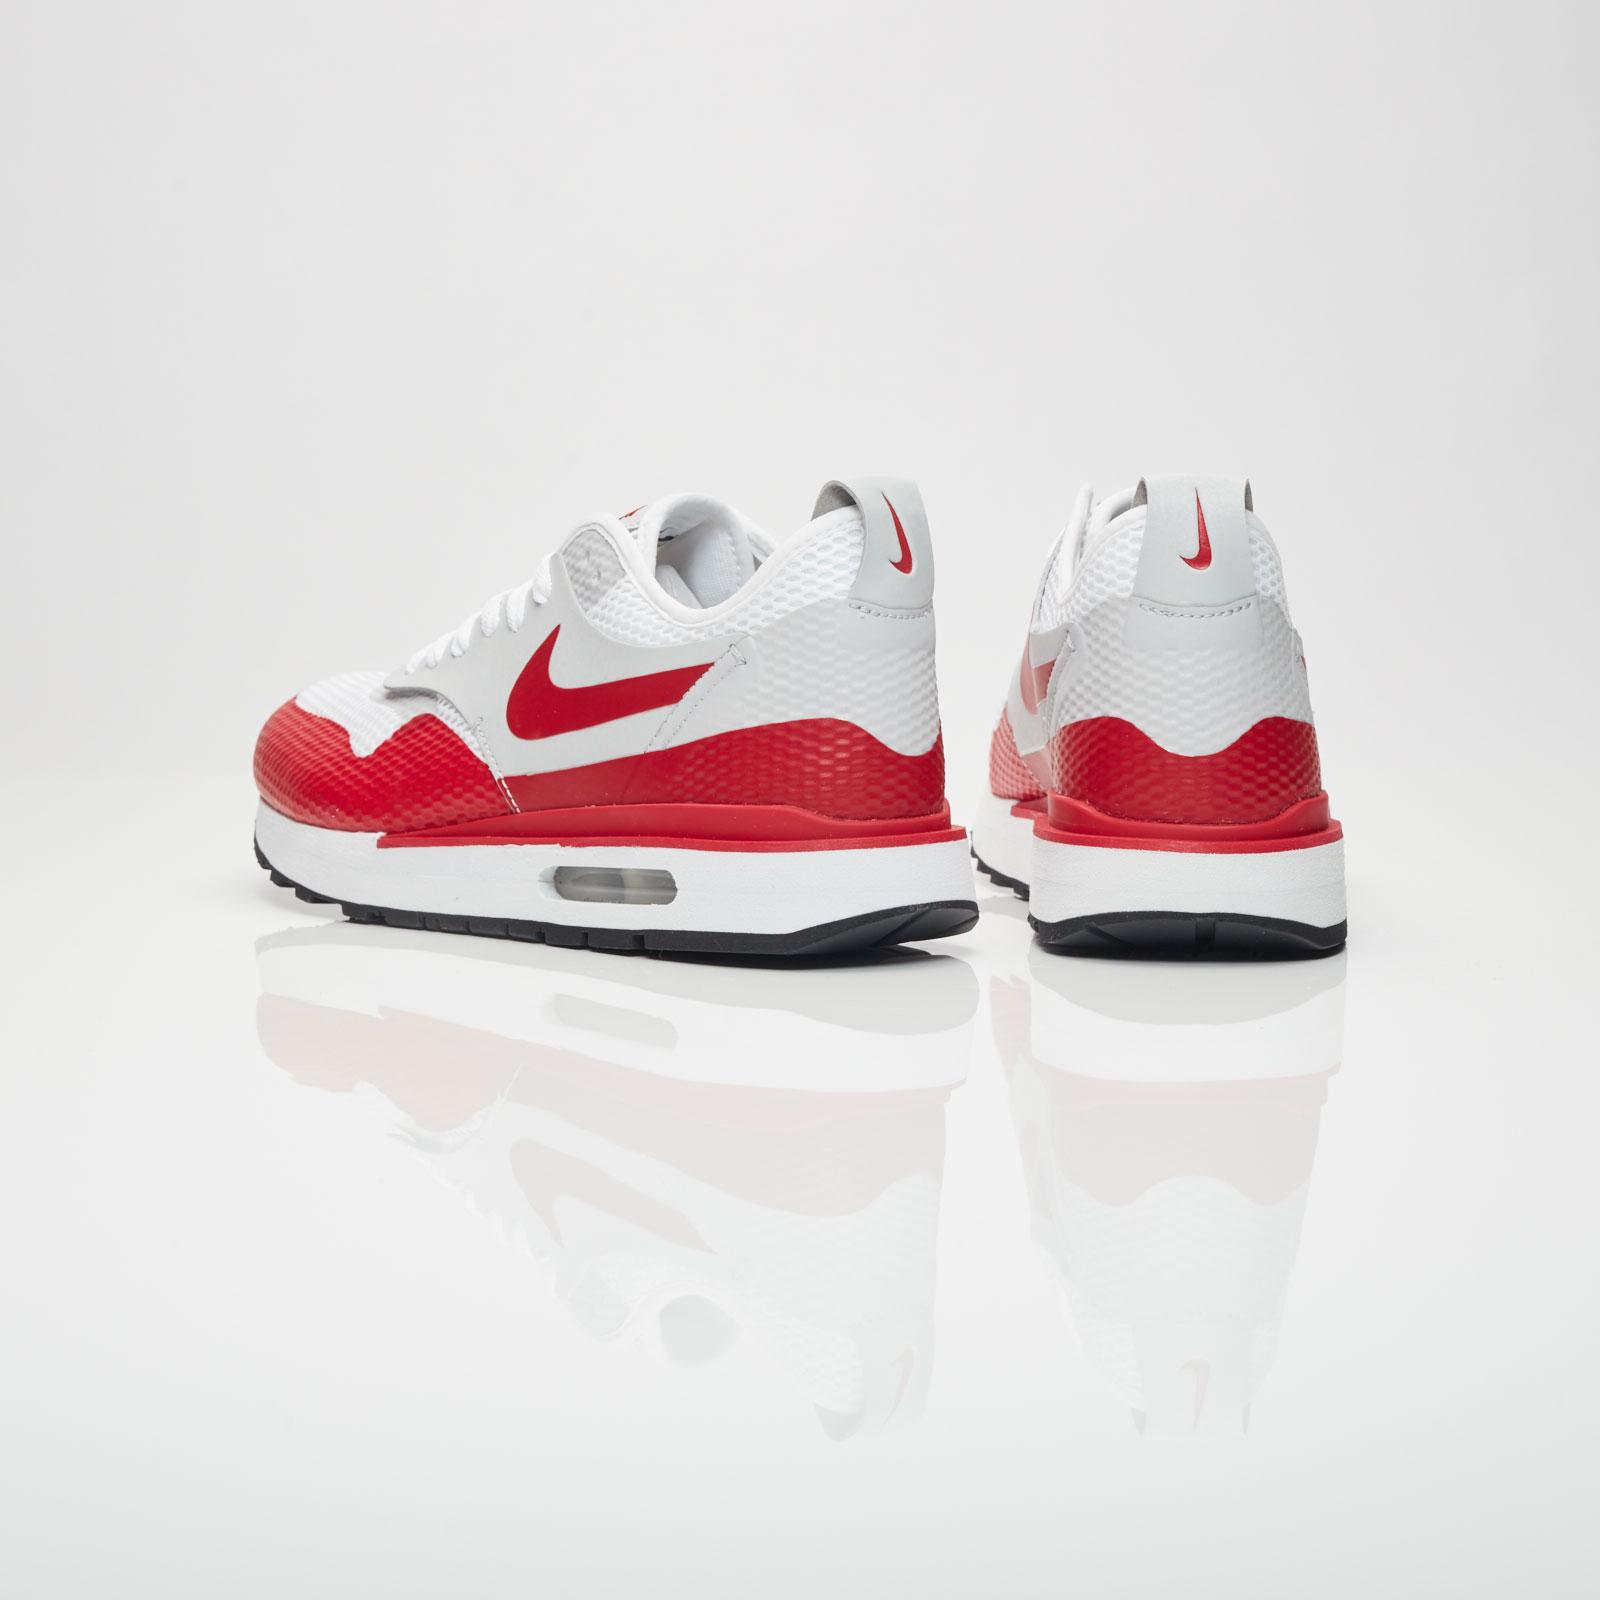 Nike Air Max 1 Royal SE SP - Aa0869-100 - Sneakersnstuff  6faa0ee9a219